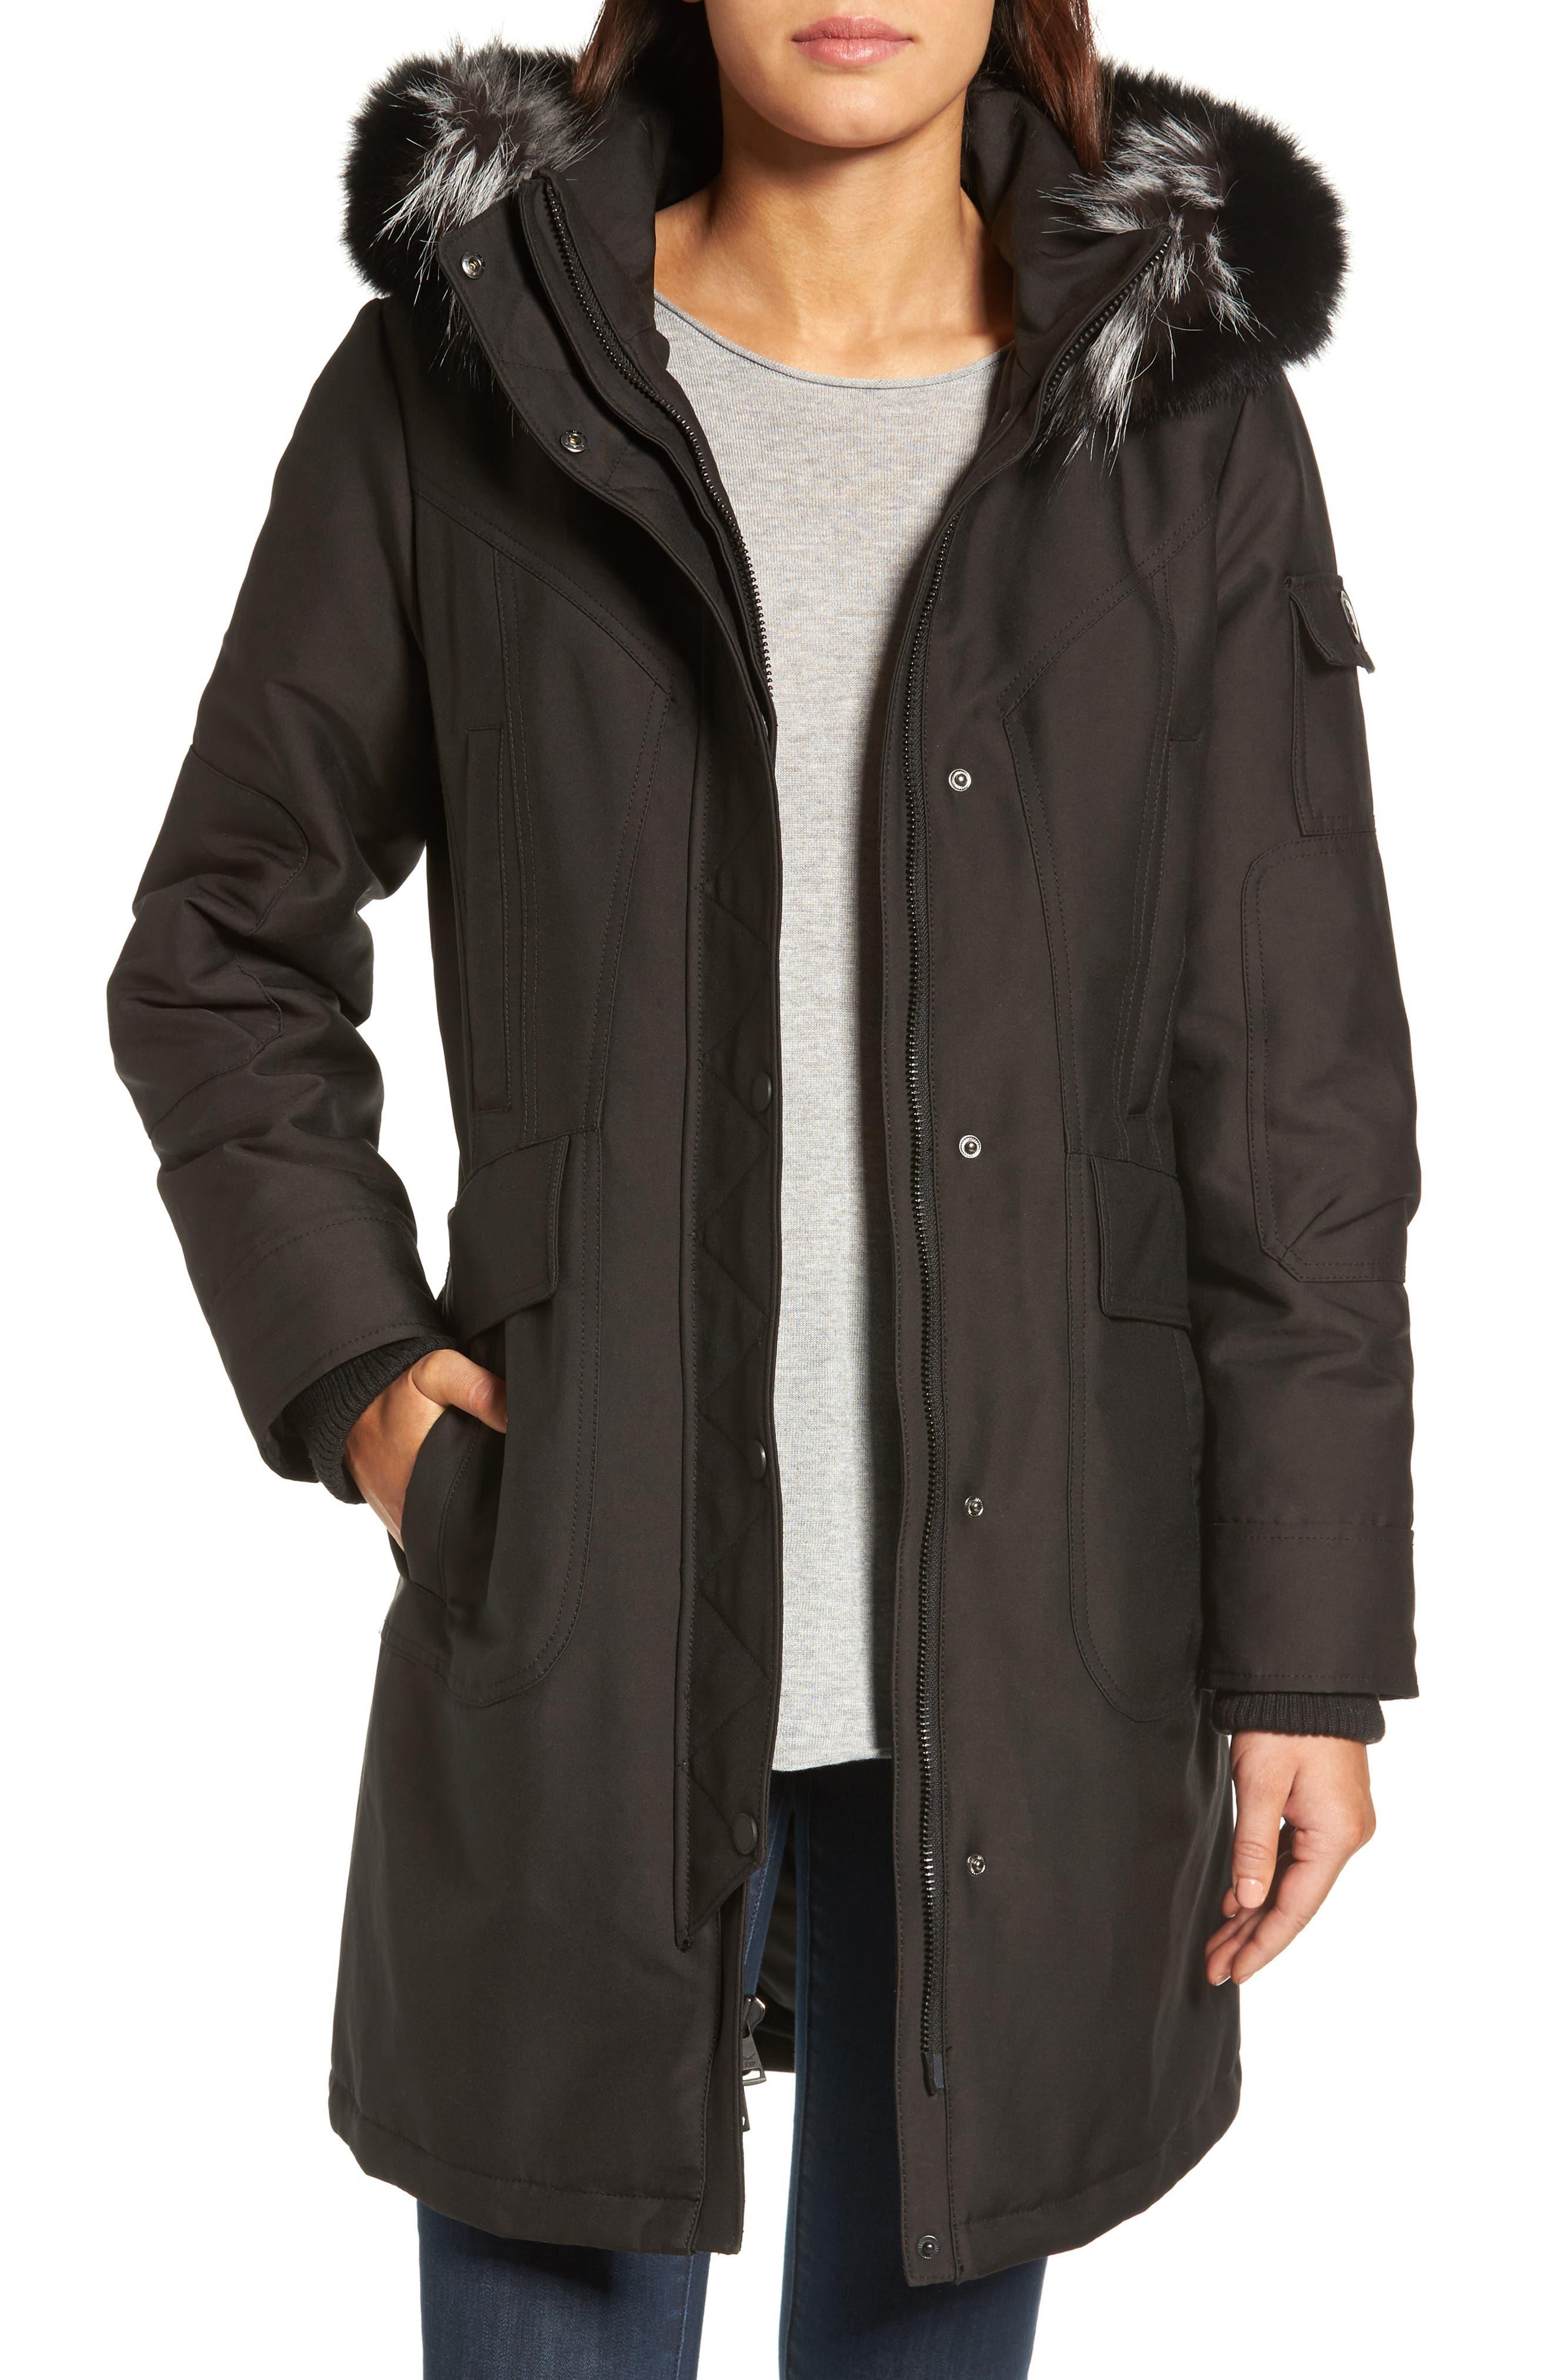 1 MADISON Parka with Removable Genuine Fox Fur Trim Hood